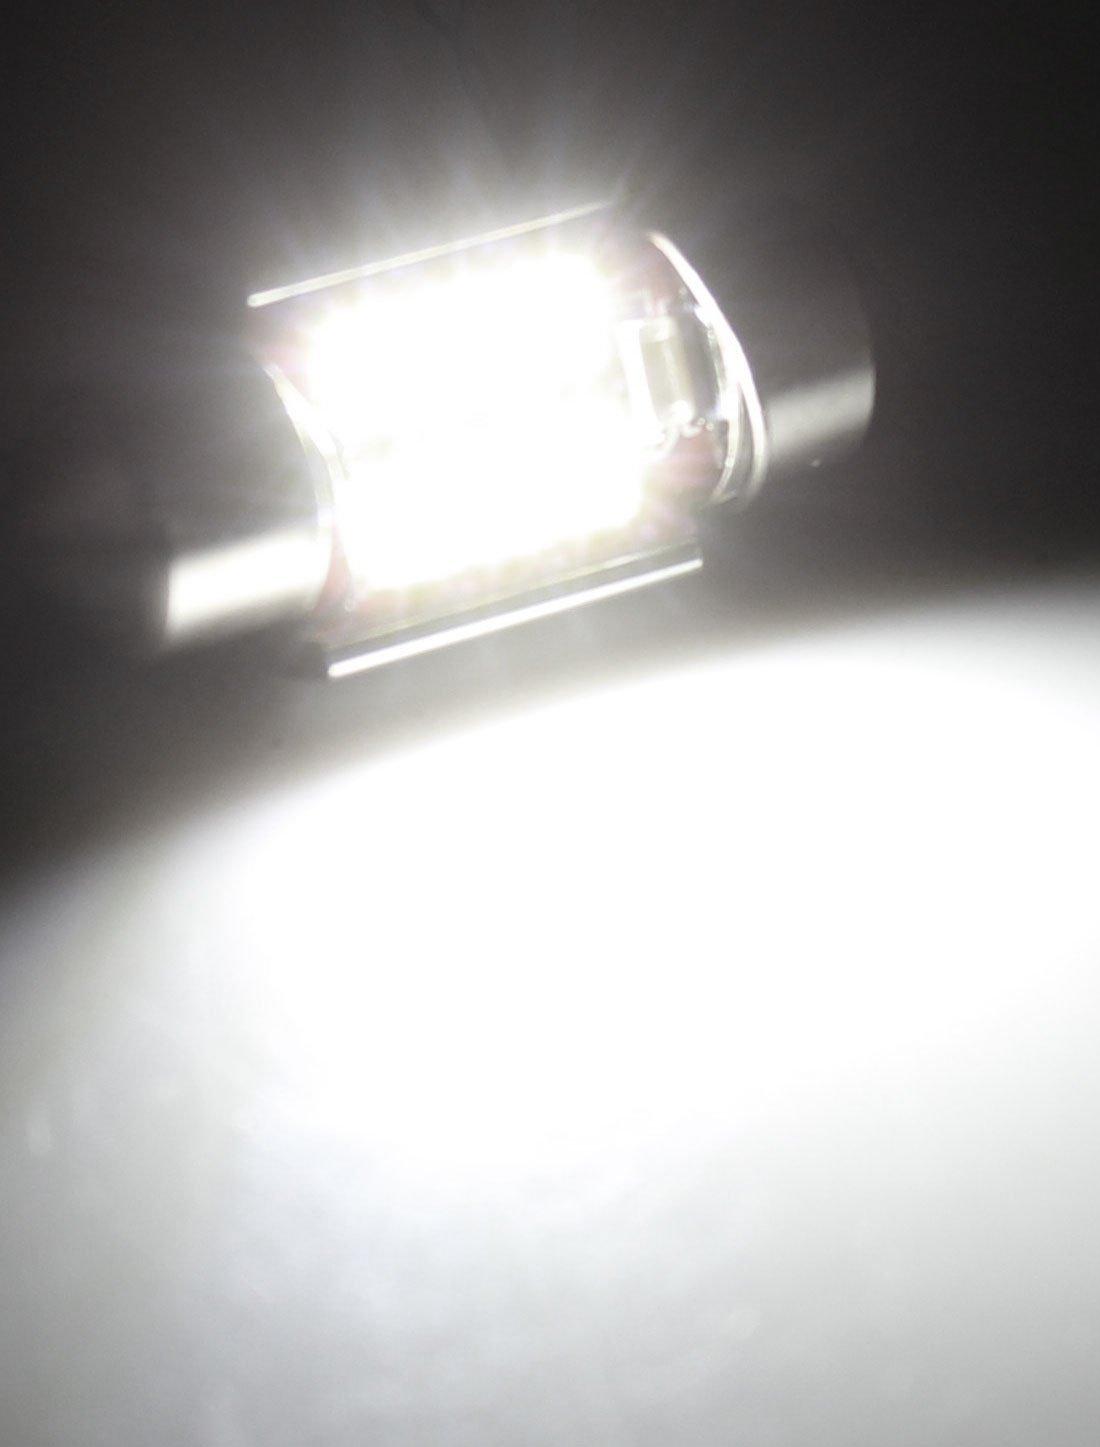 Amazon.com: eDealMax 2 x 31mm 3528 SMD 6 LED No Error Dome luz Blanca: Automotive